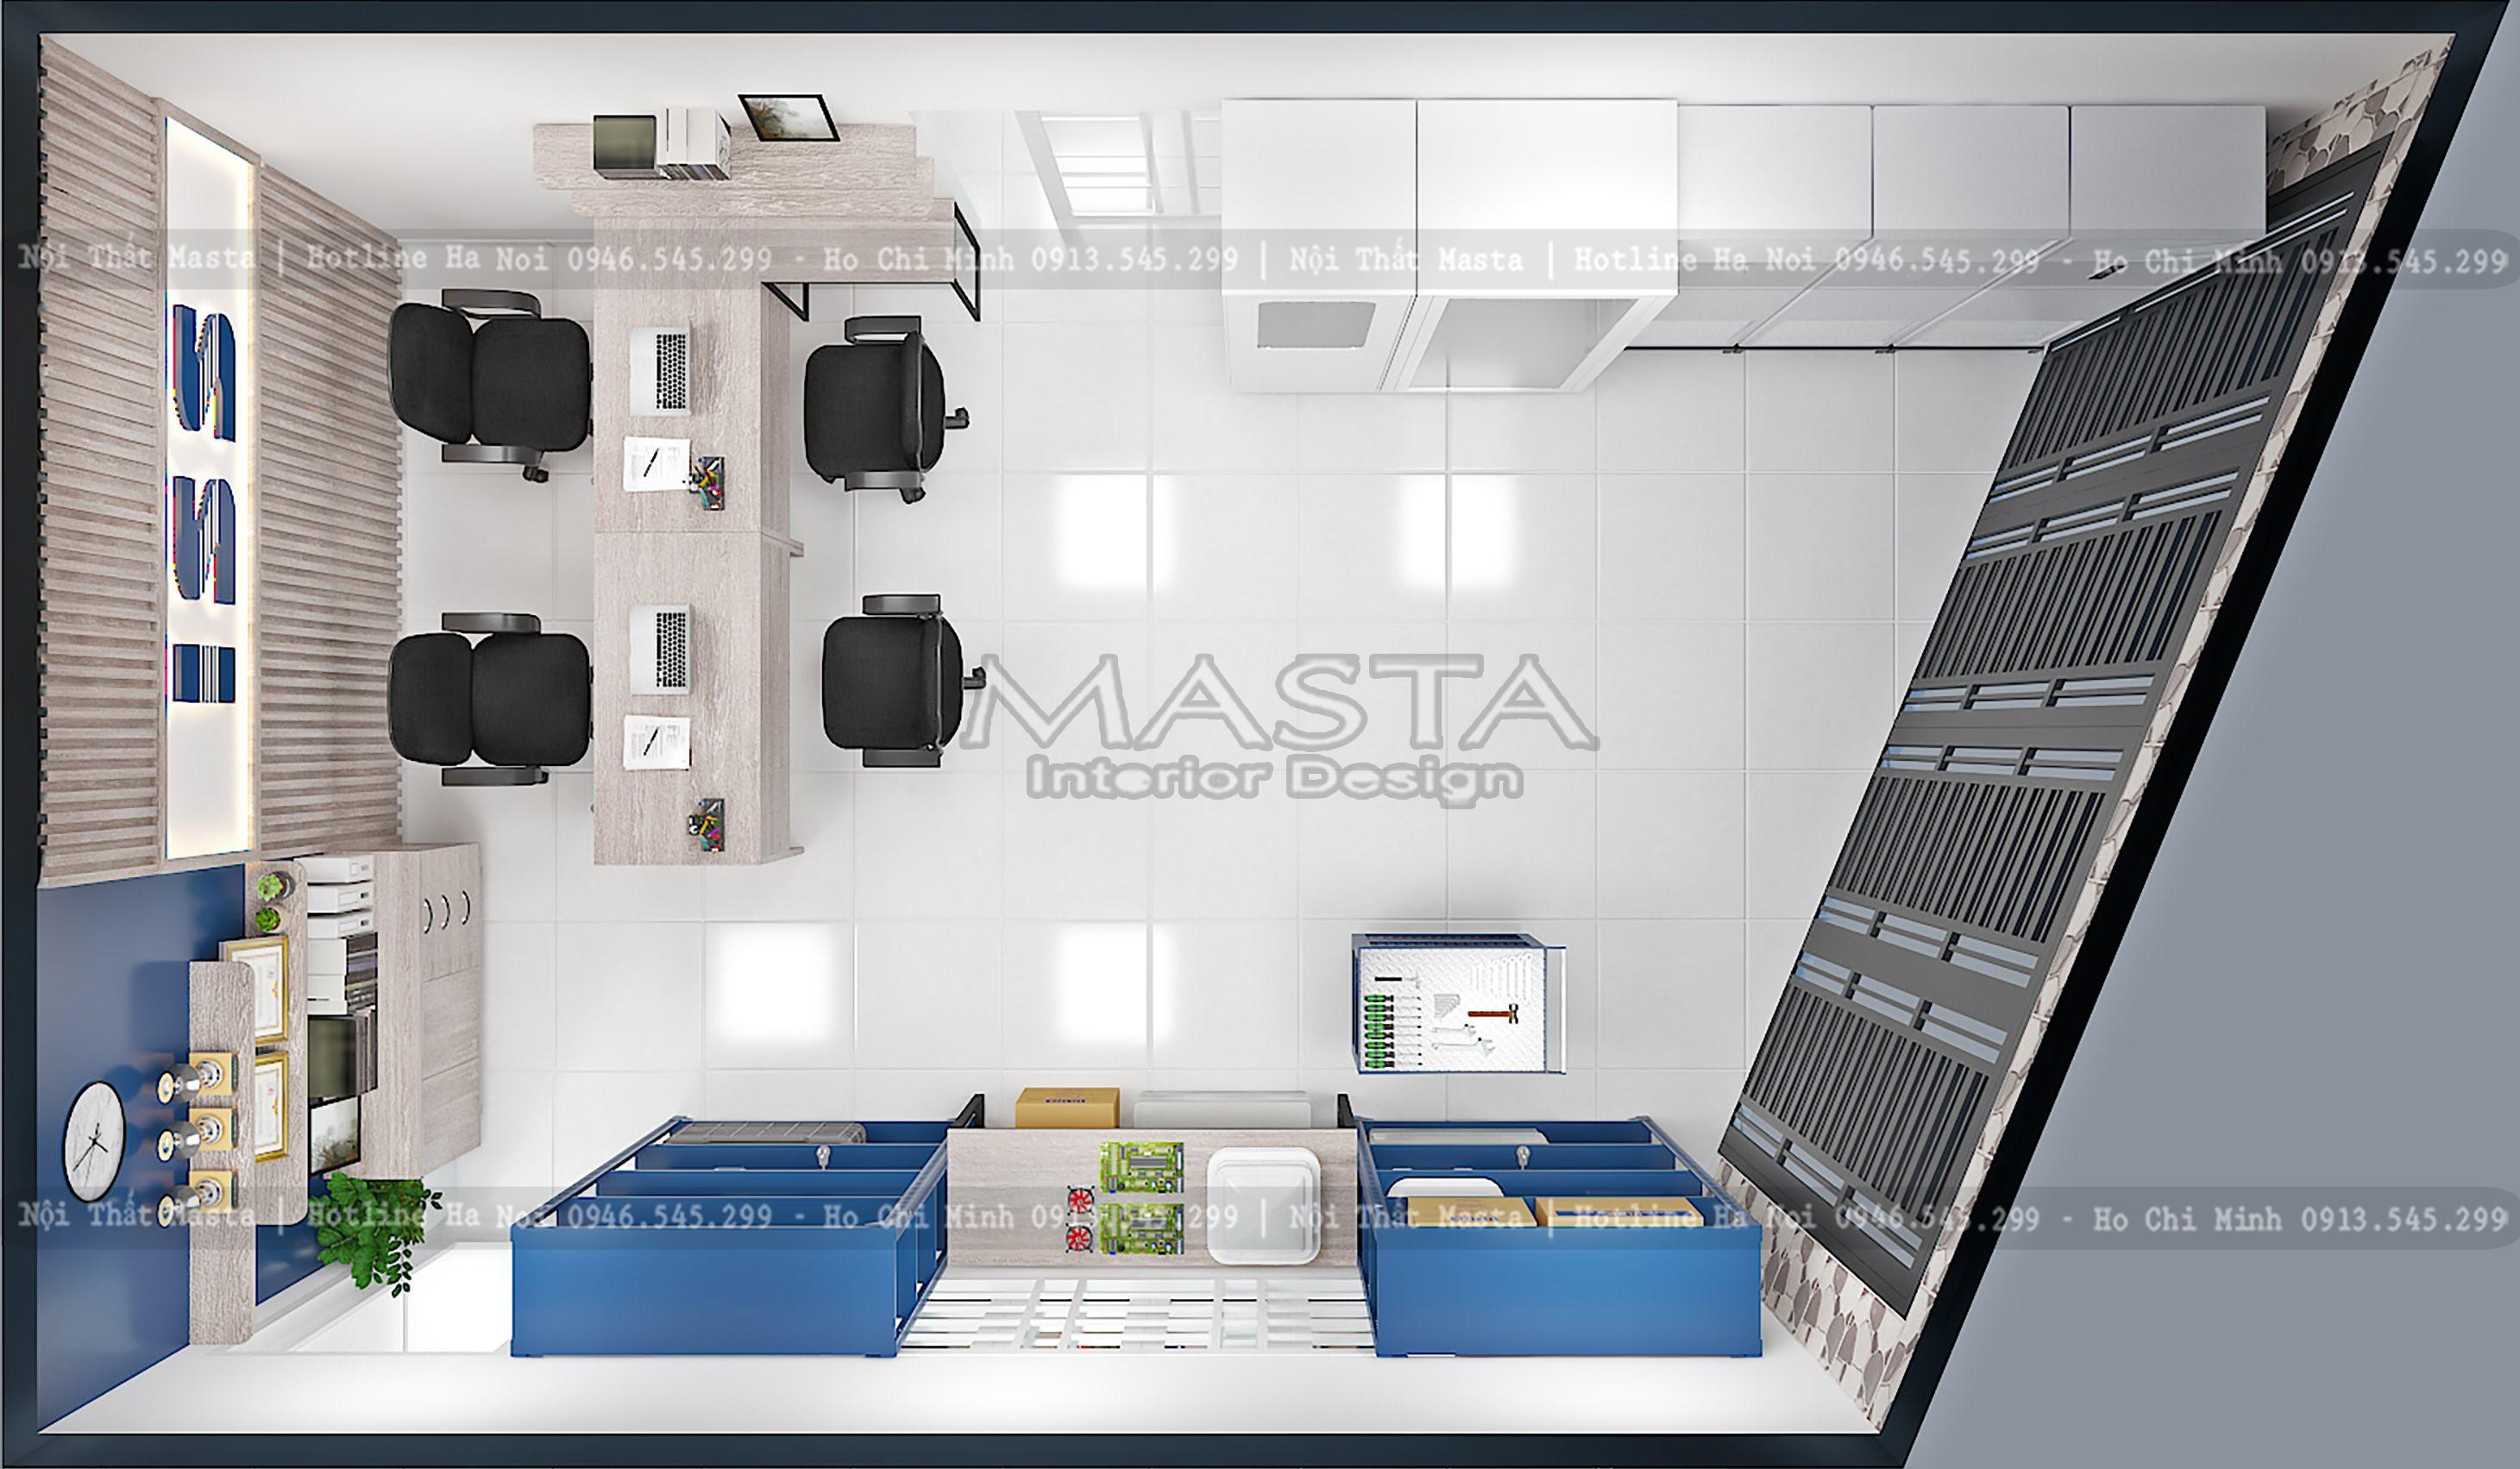 Tổng thể thiết kế showroom ISS